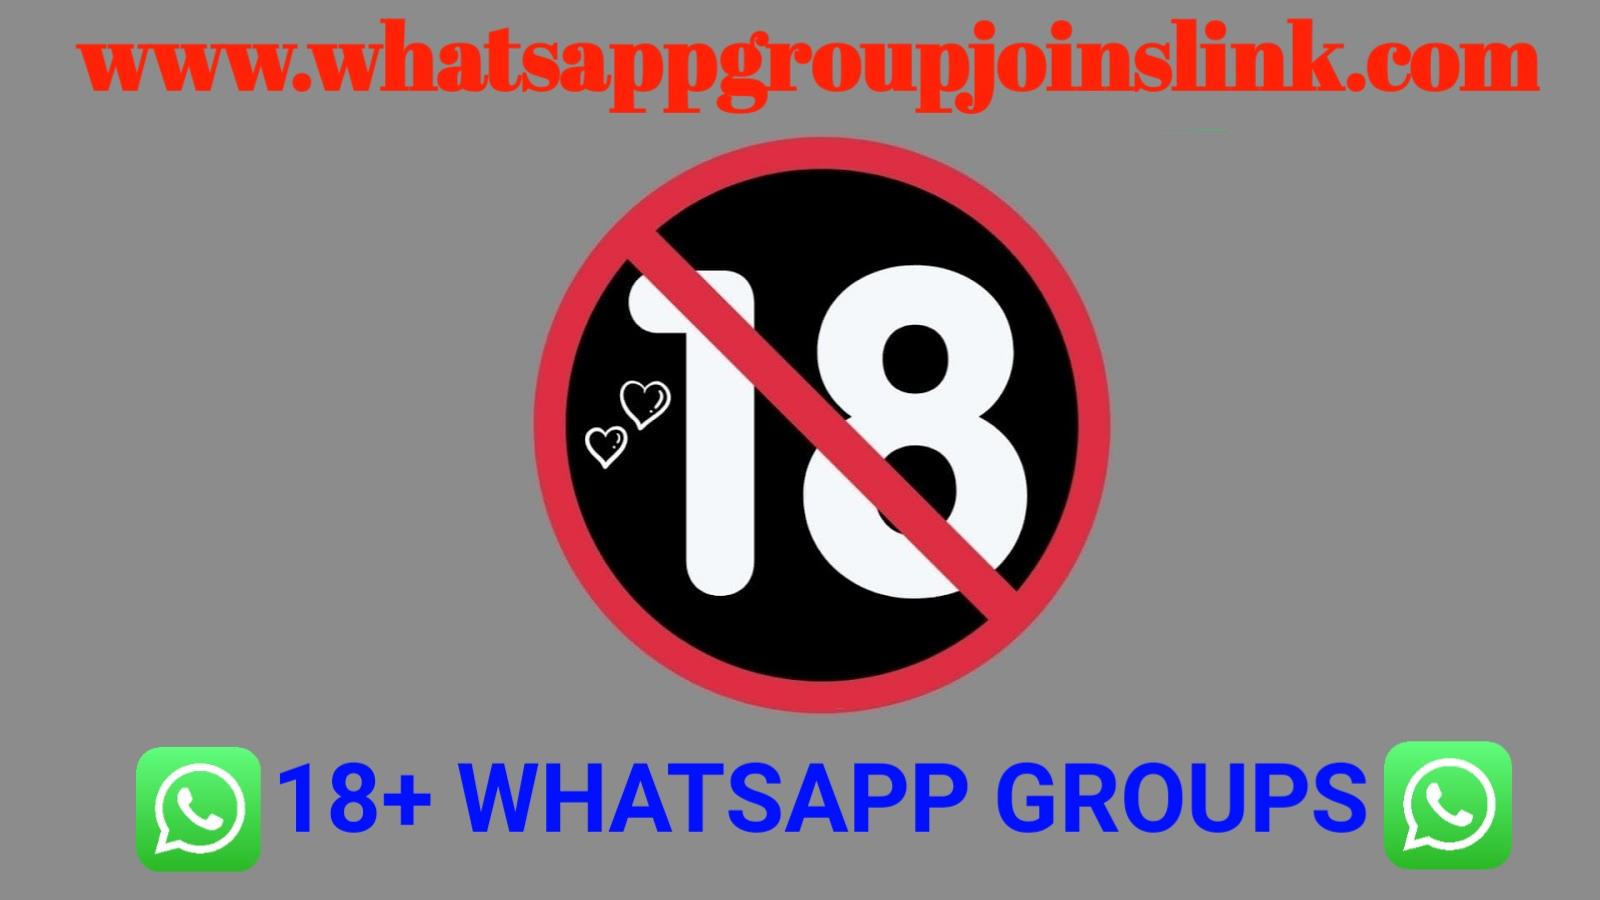 18+ WhatsApp Group Joins Link | Whatsapp Group Links 2019